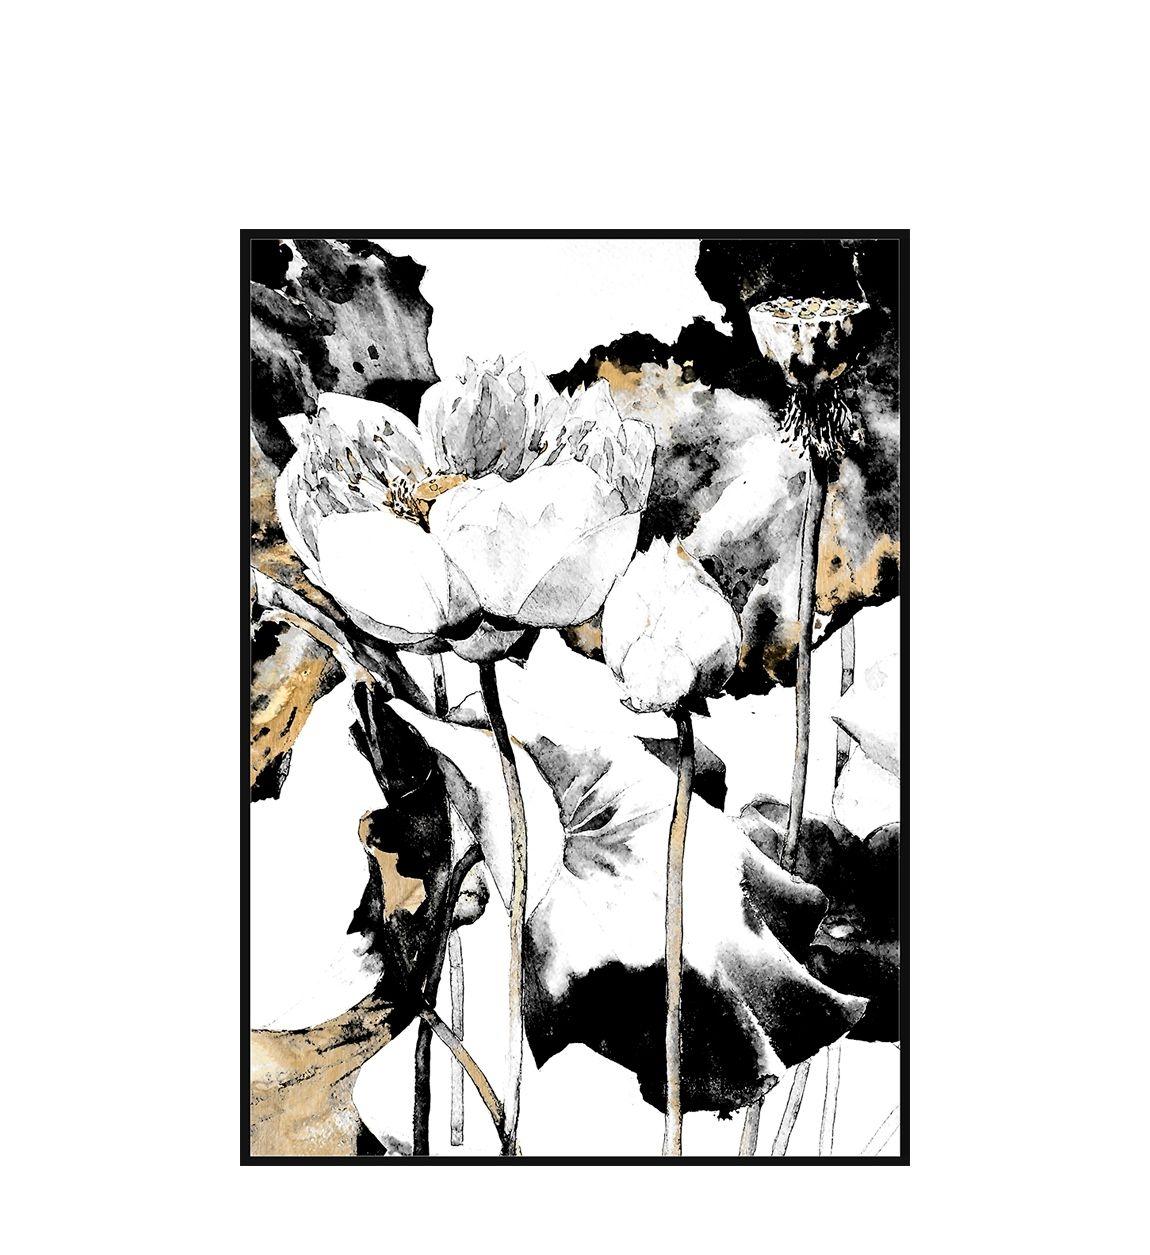 Tablou Canvas Creta Two Flowers, 80 x 120 cm imagine